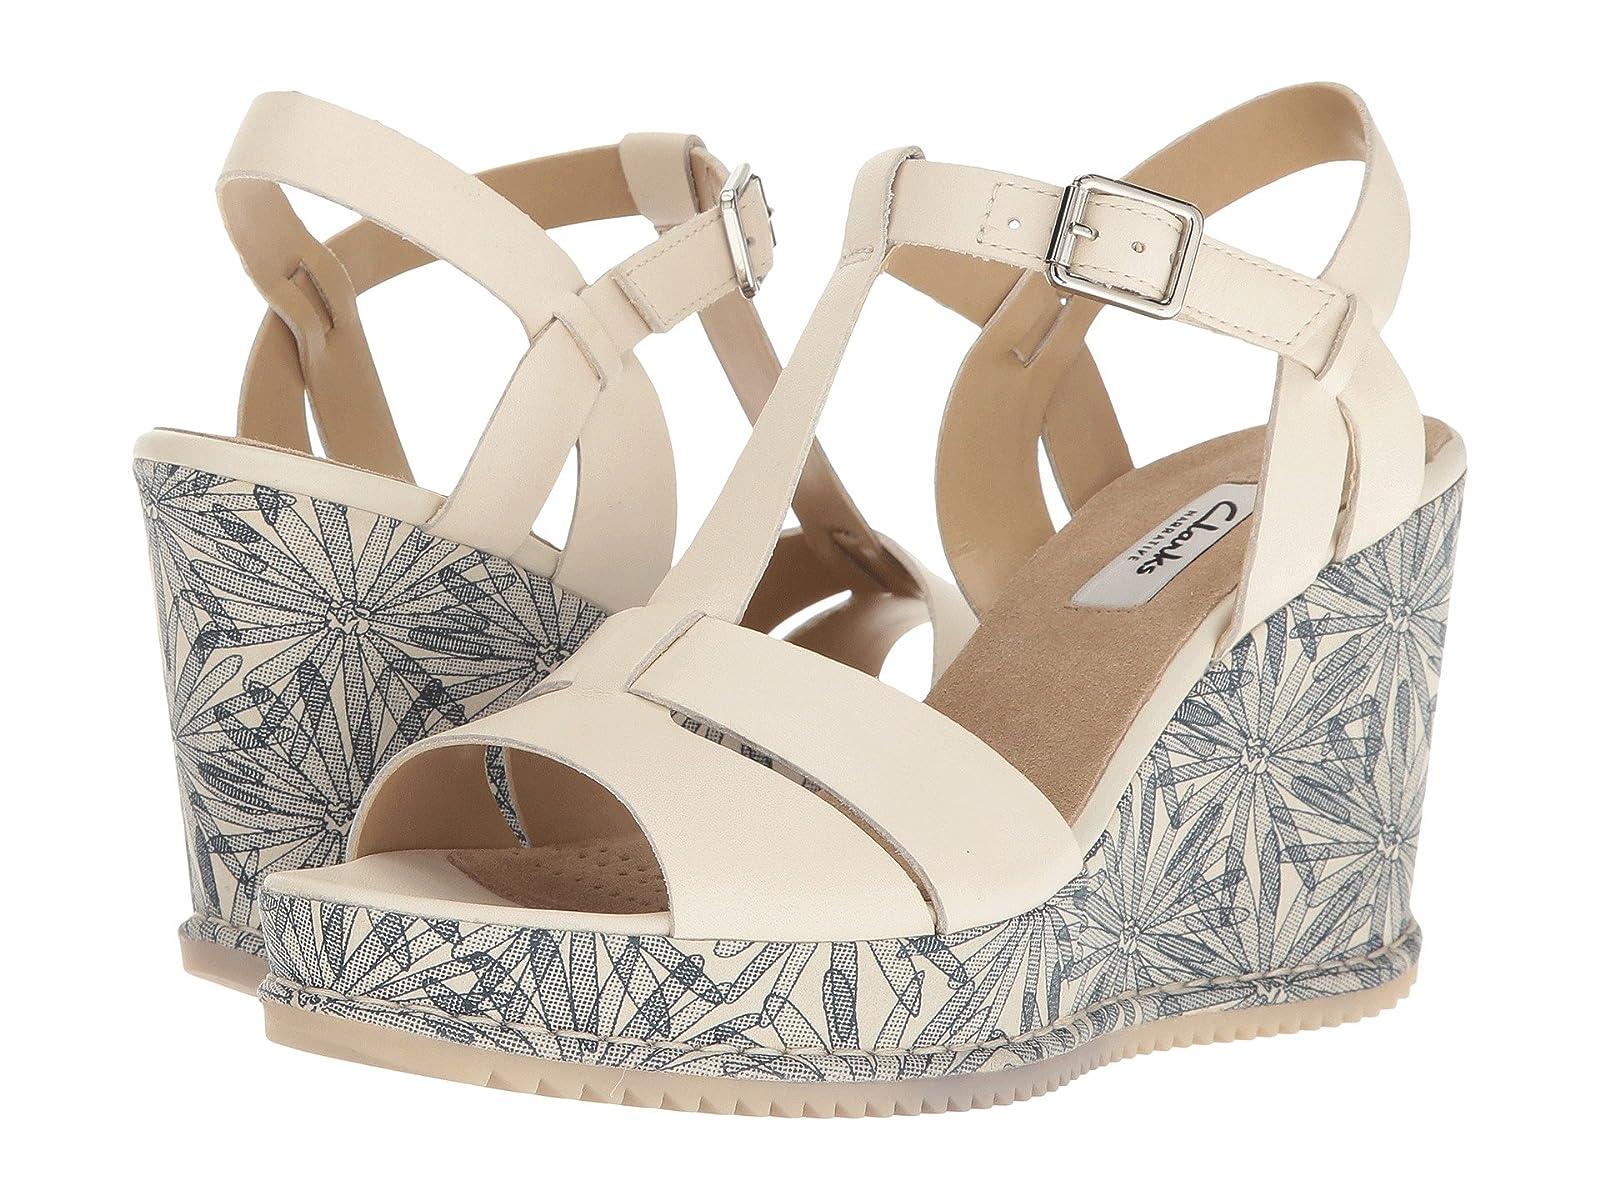 Clarks Adesha RiverCheap and distinctive eye-catching shoes